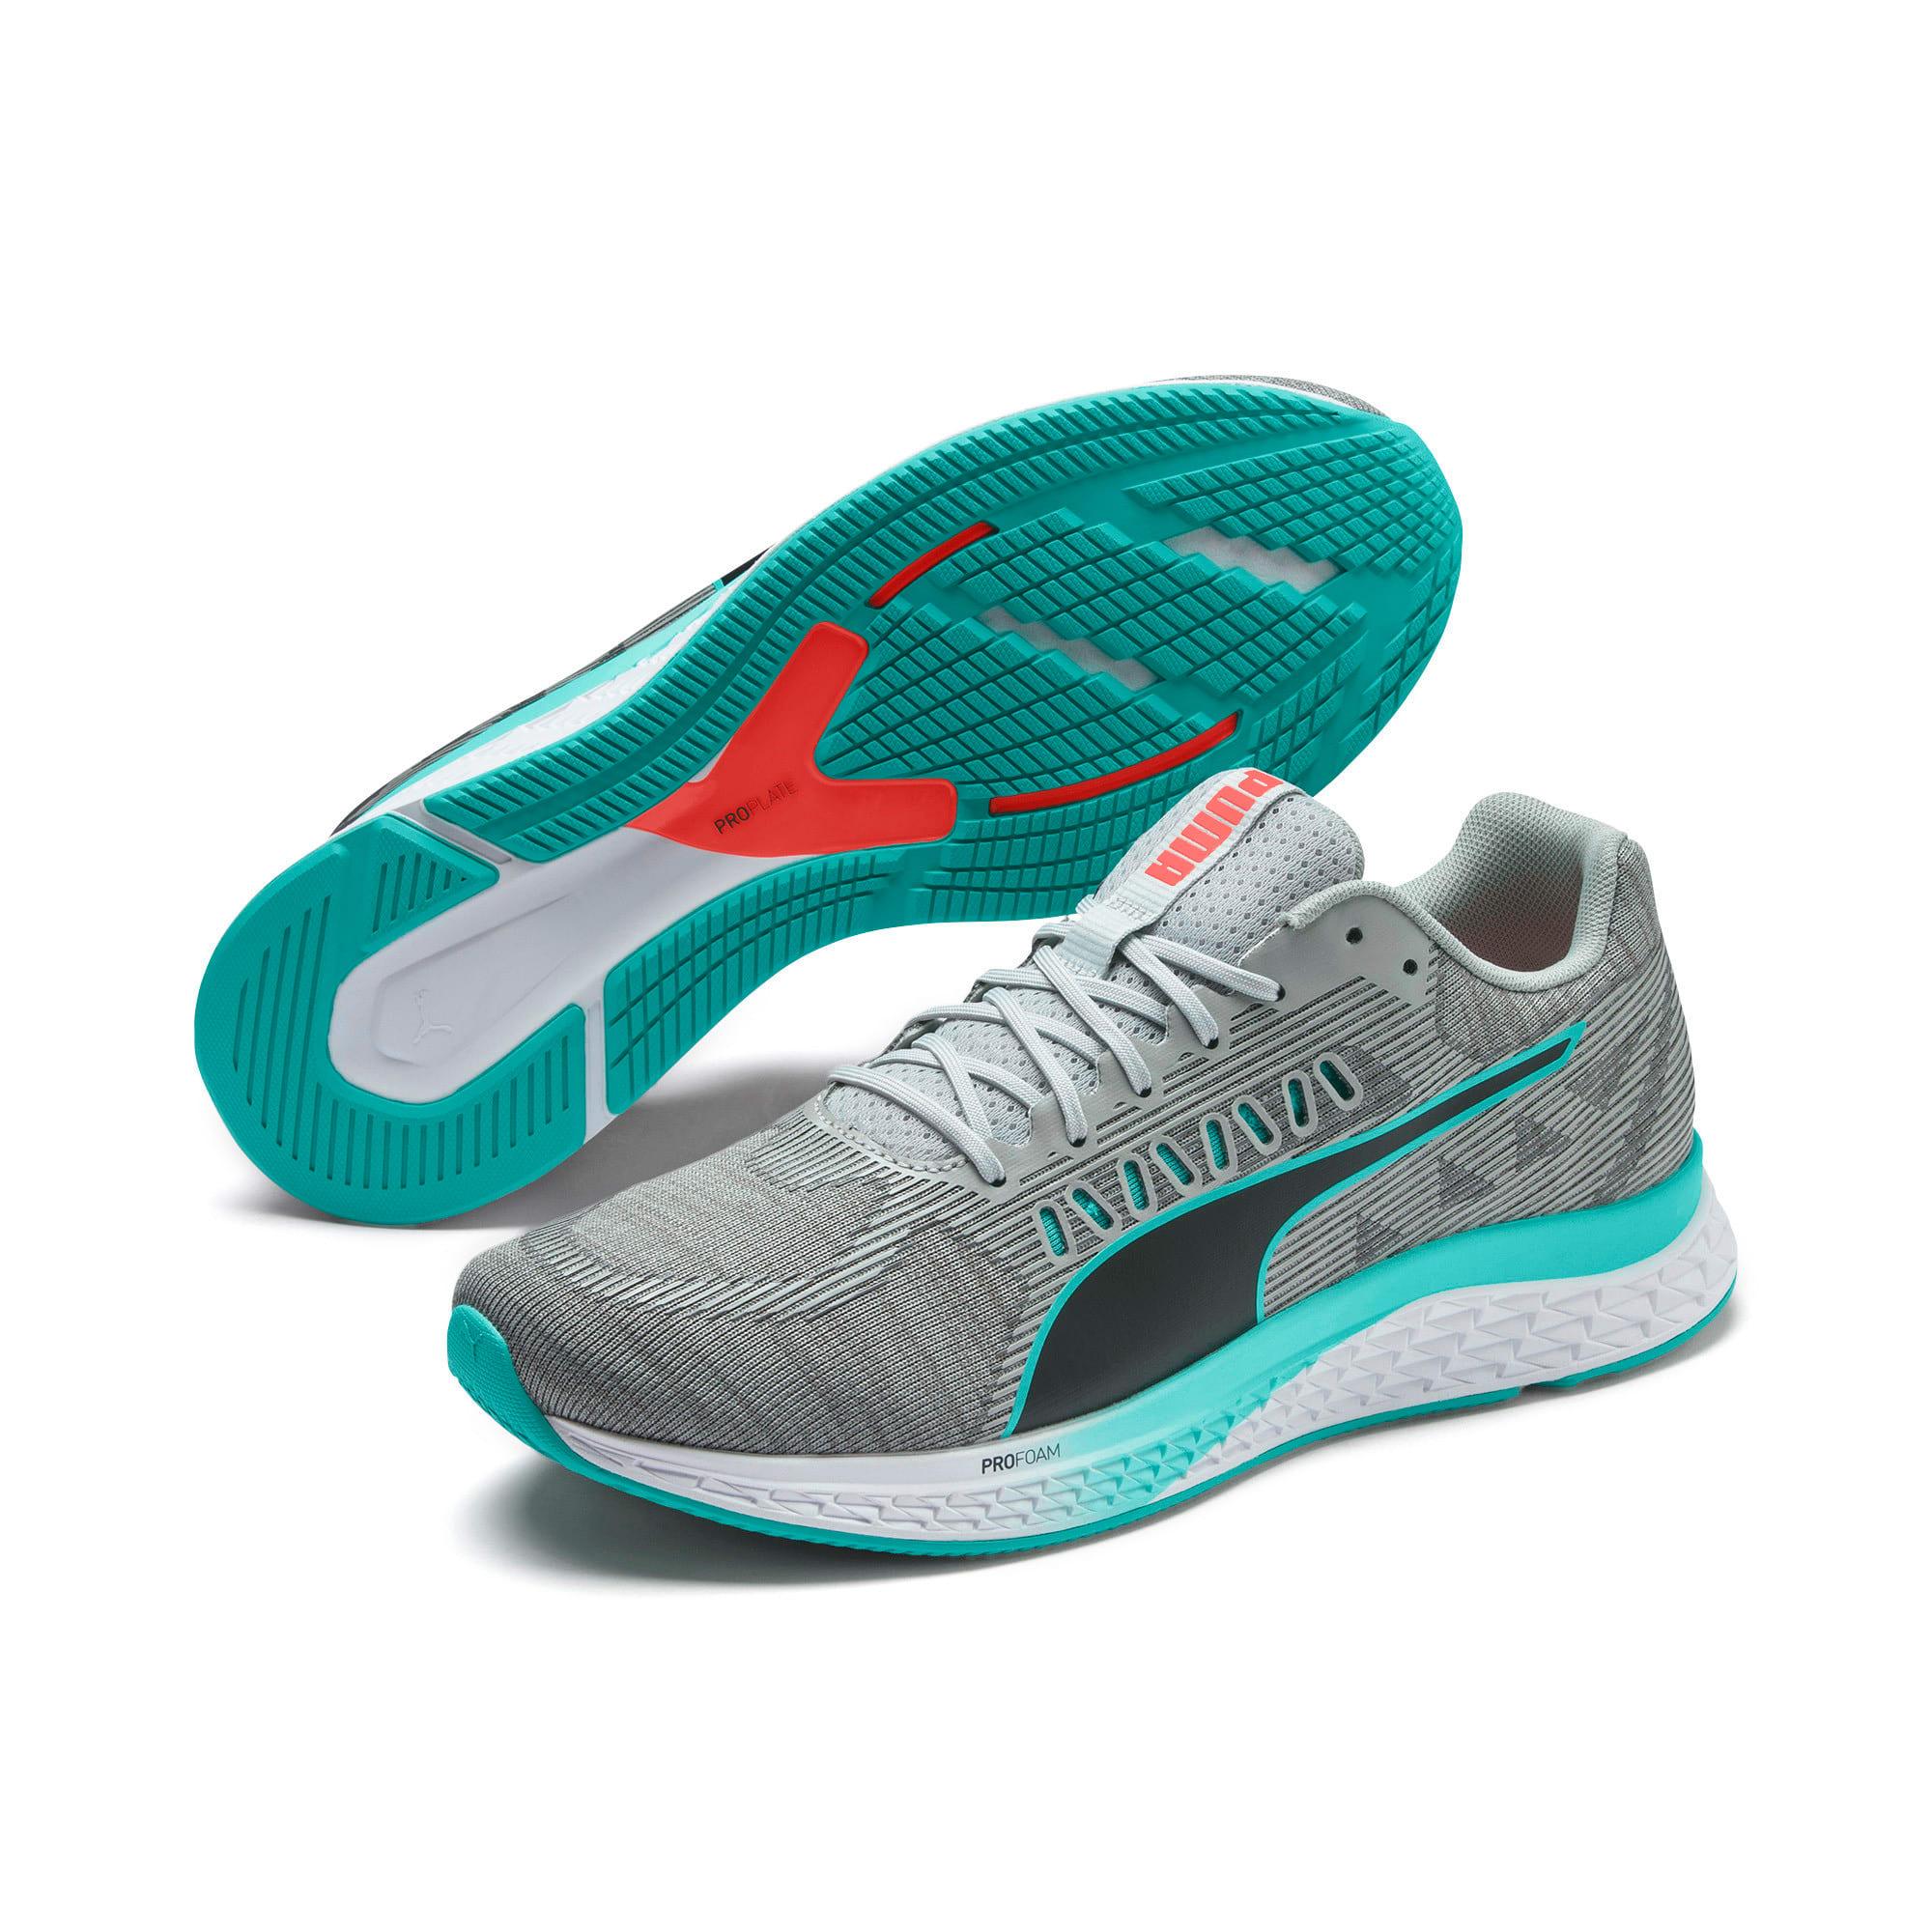 Thumbnail 4 of SPEED SUTAMINA Running Shoes, High Rise-Nrgy Red-Blue Turq, medium-IND